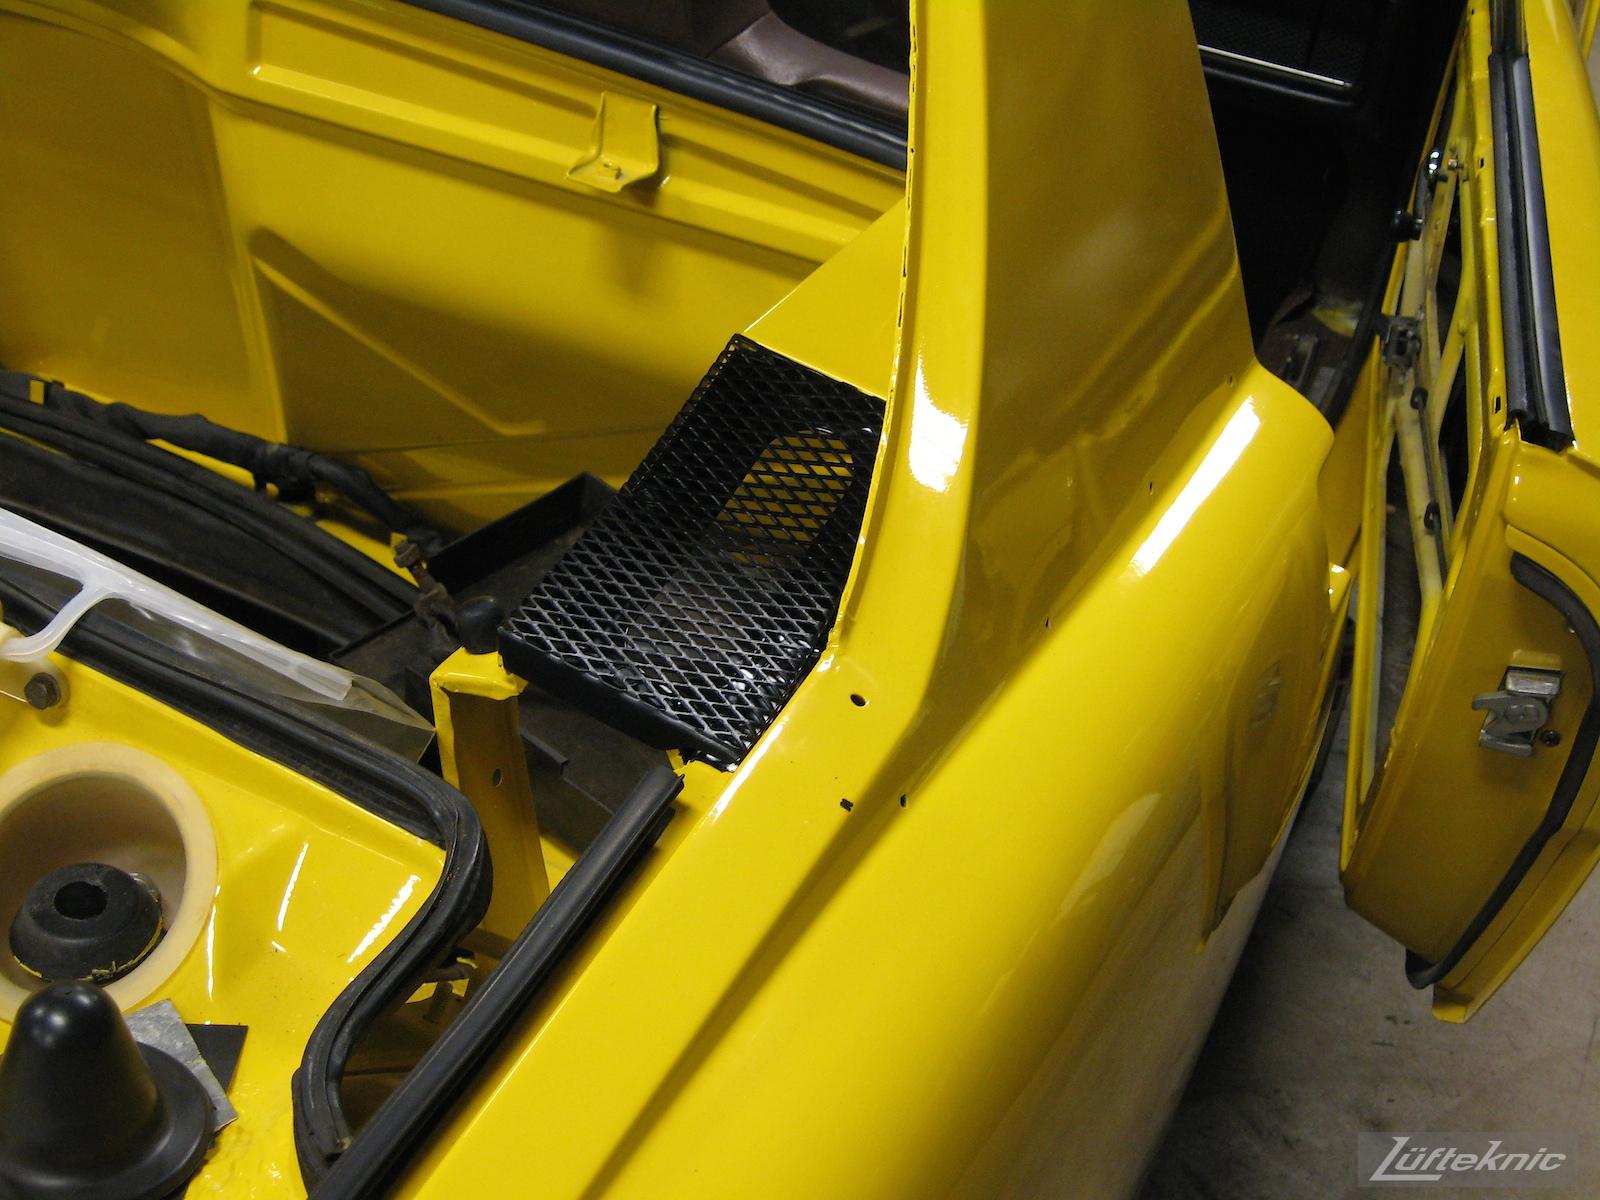 Rear engine decklid cover details on a restored yellow Porsche 914 at Lufteknic.